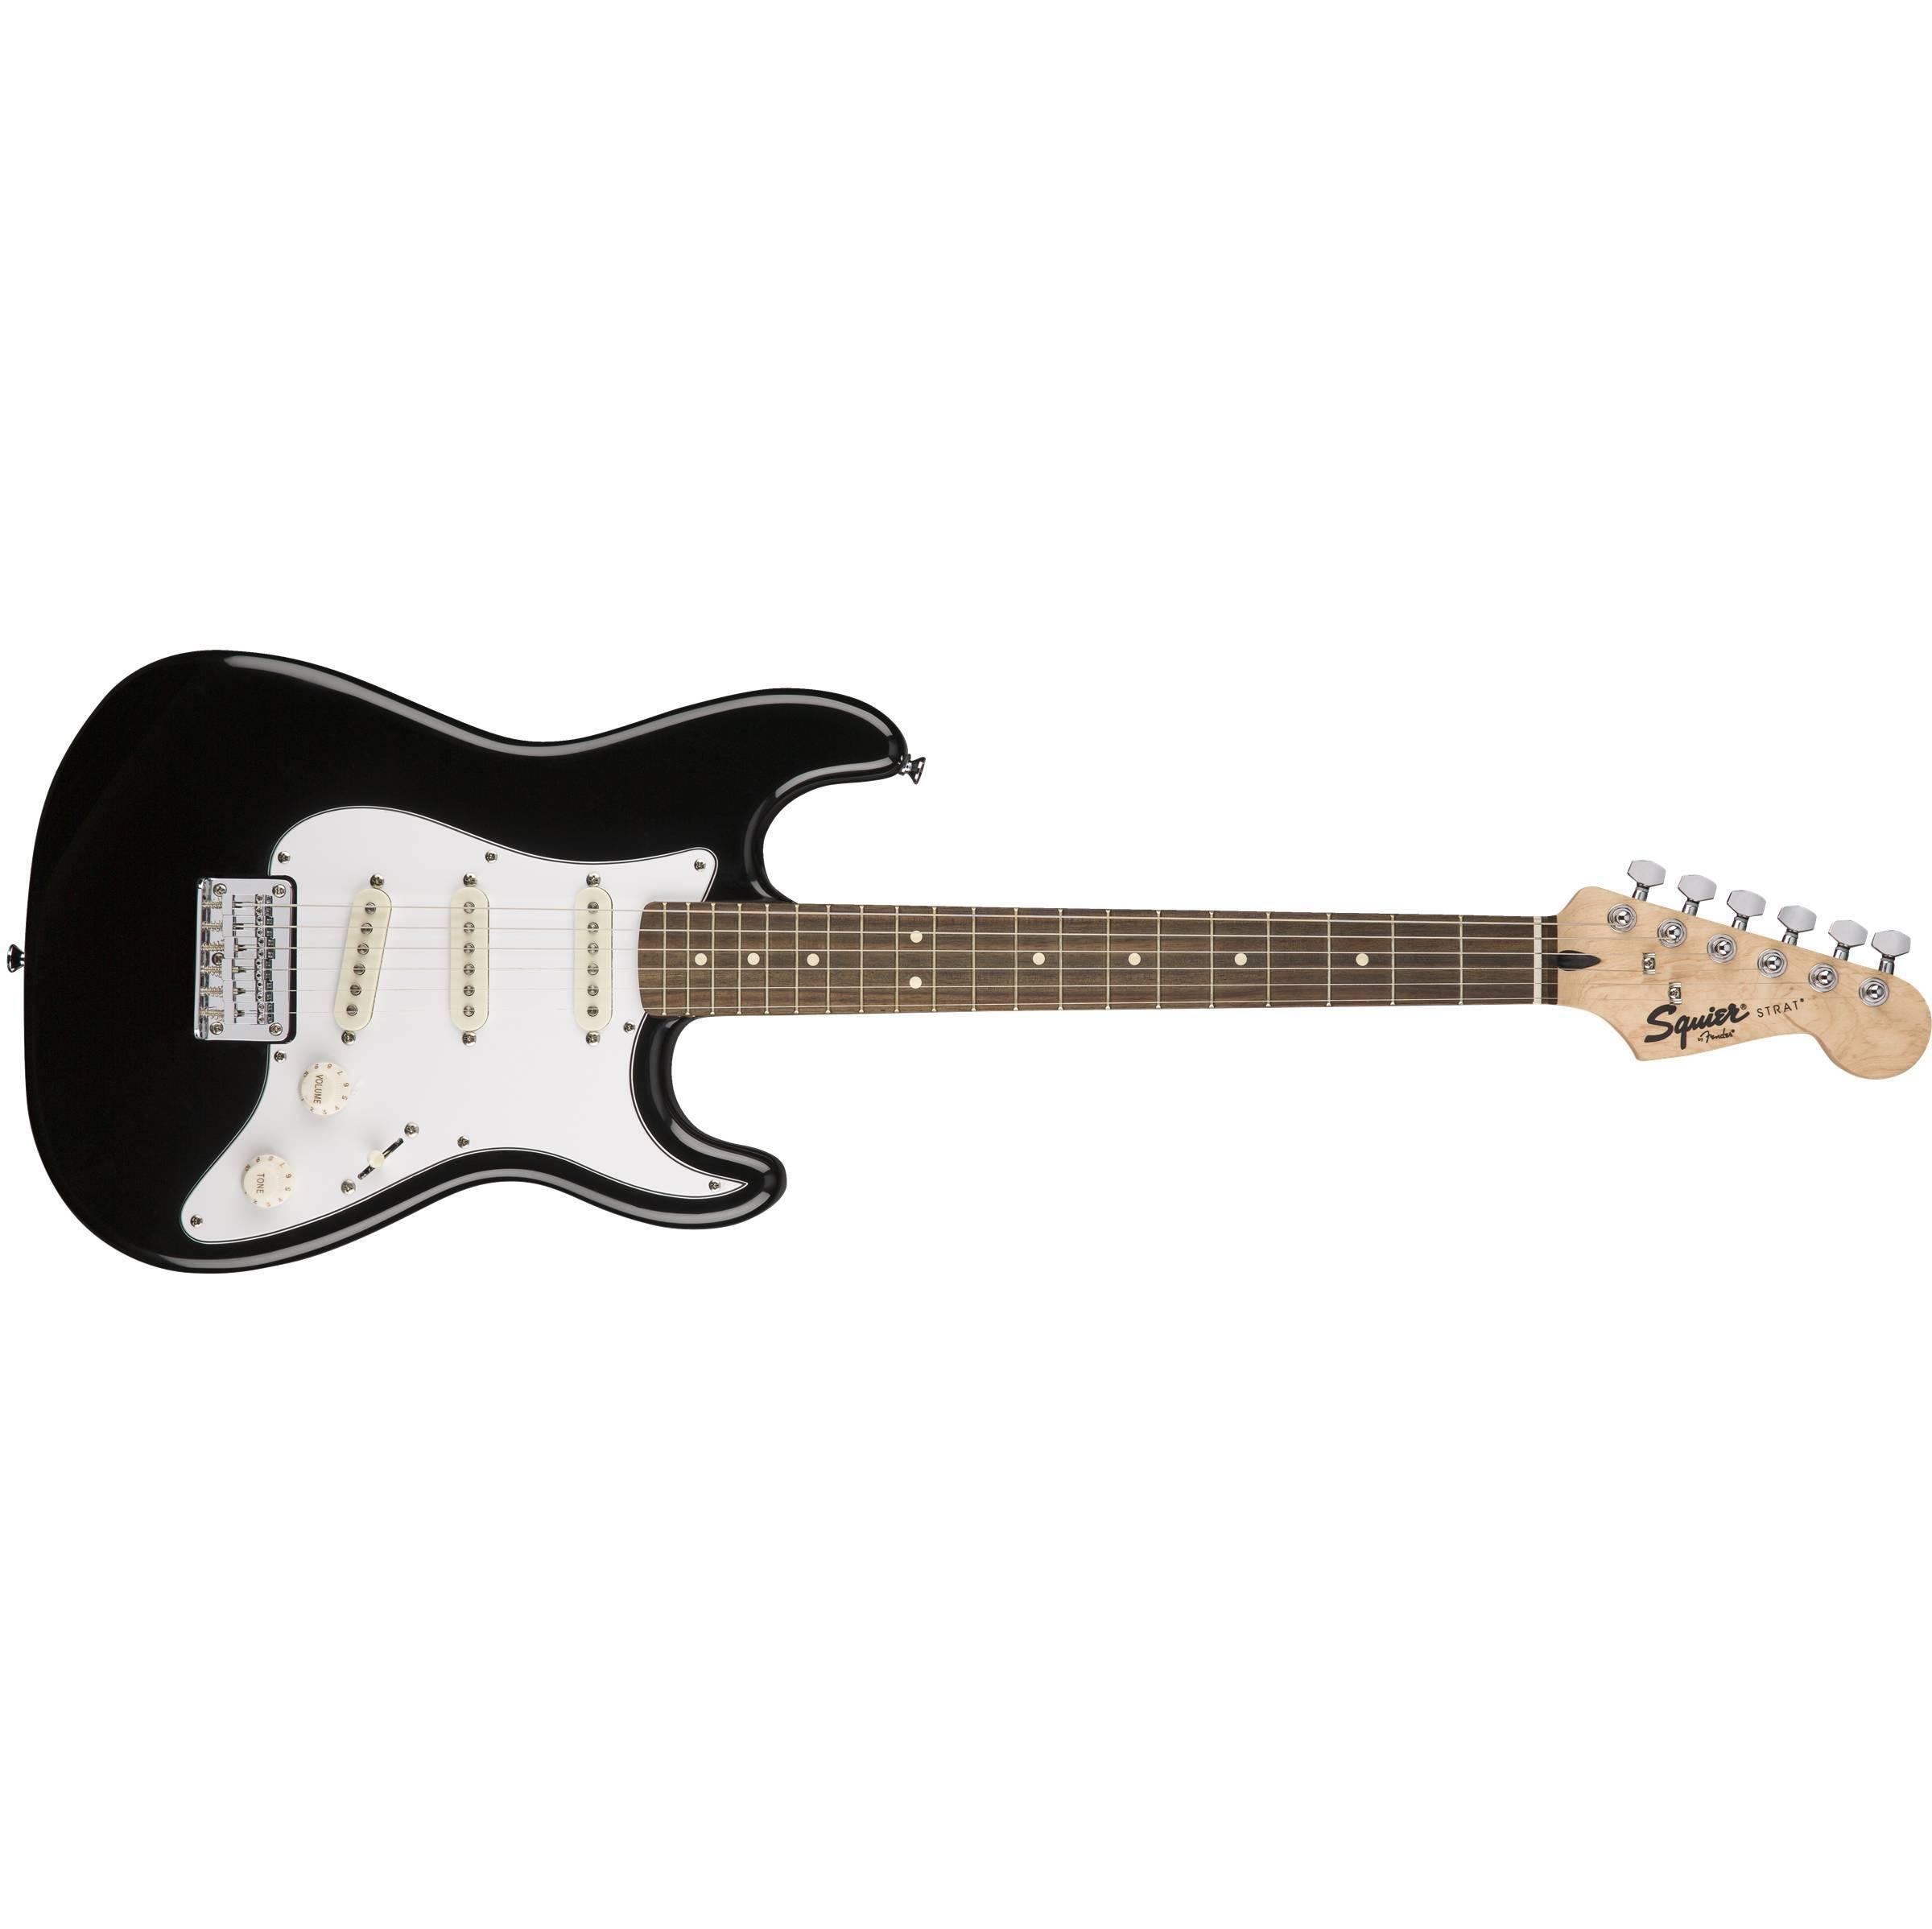 Paquete Guitarra Electrica Fender stratocaster negro